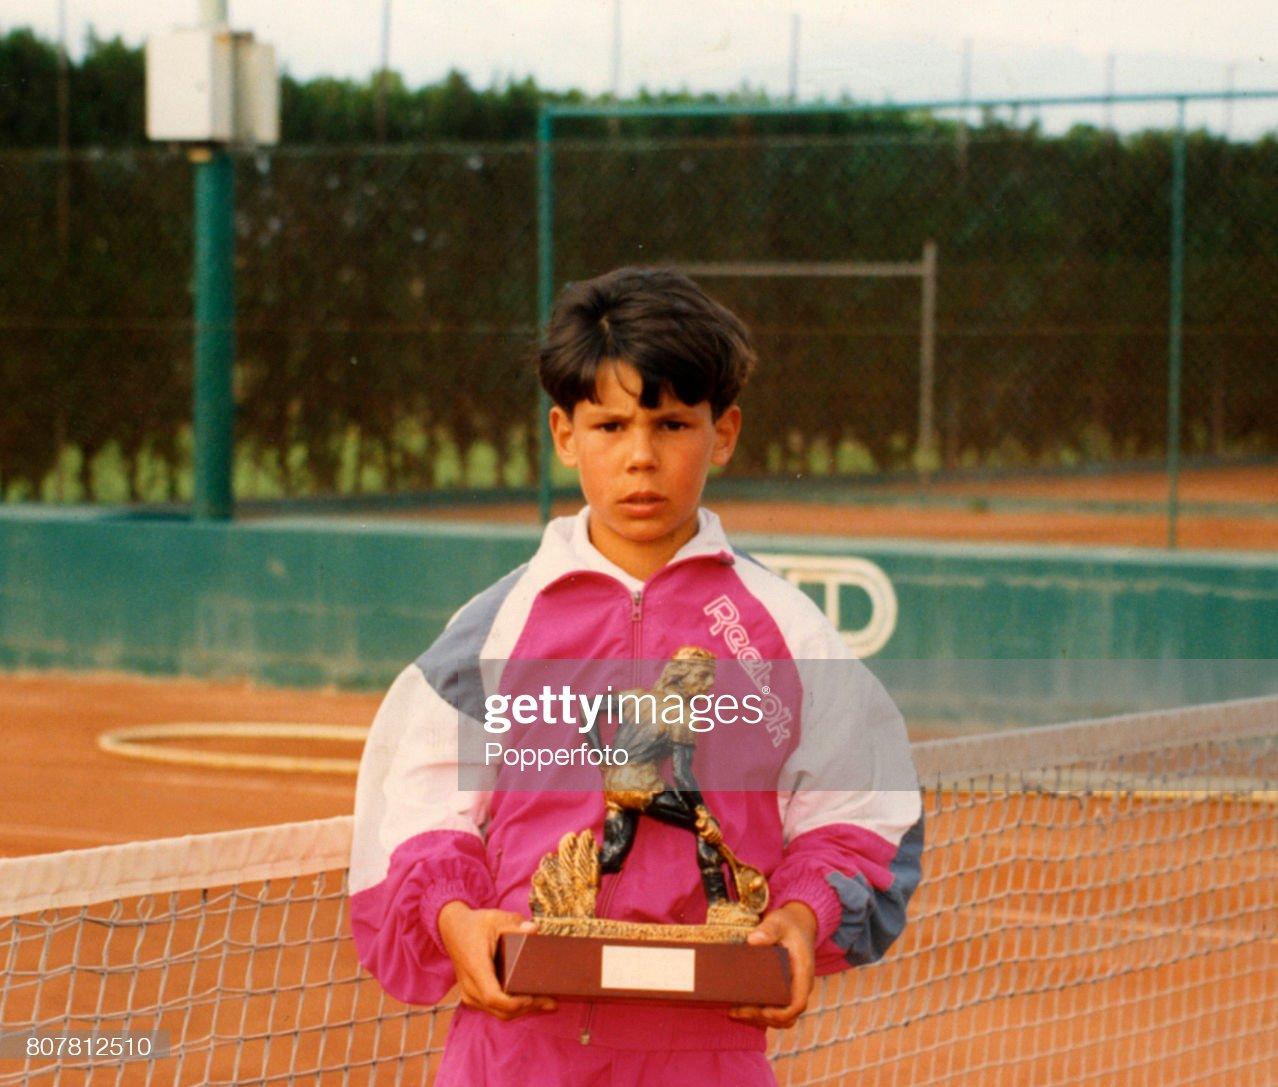 Rafael Nadal : News Photo